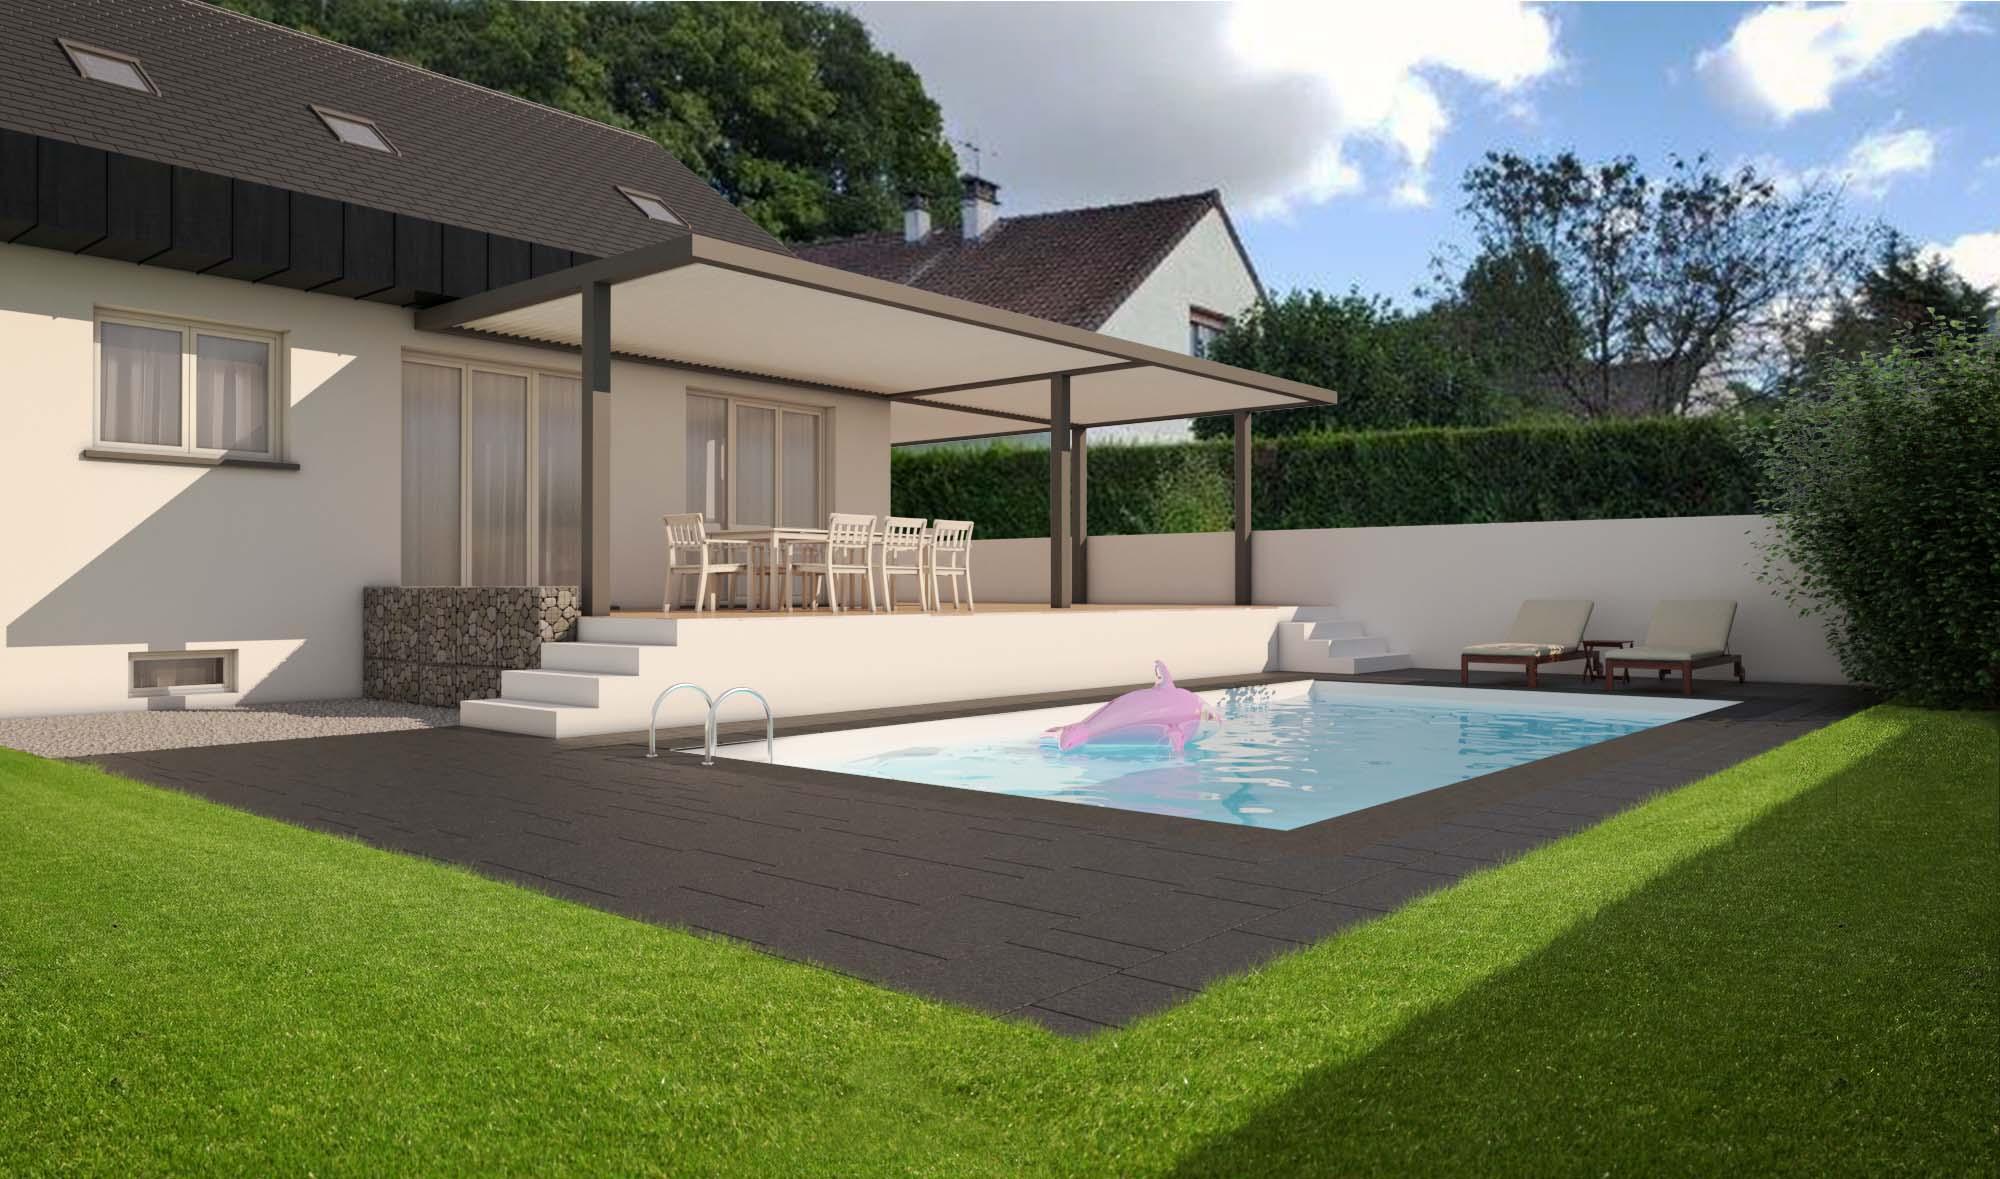 Requalification façade sur jardin, bois, zinc, piscine, terrasse et pergola